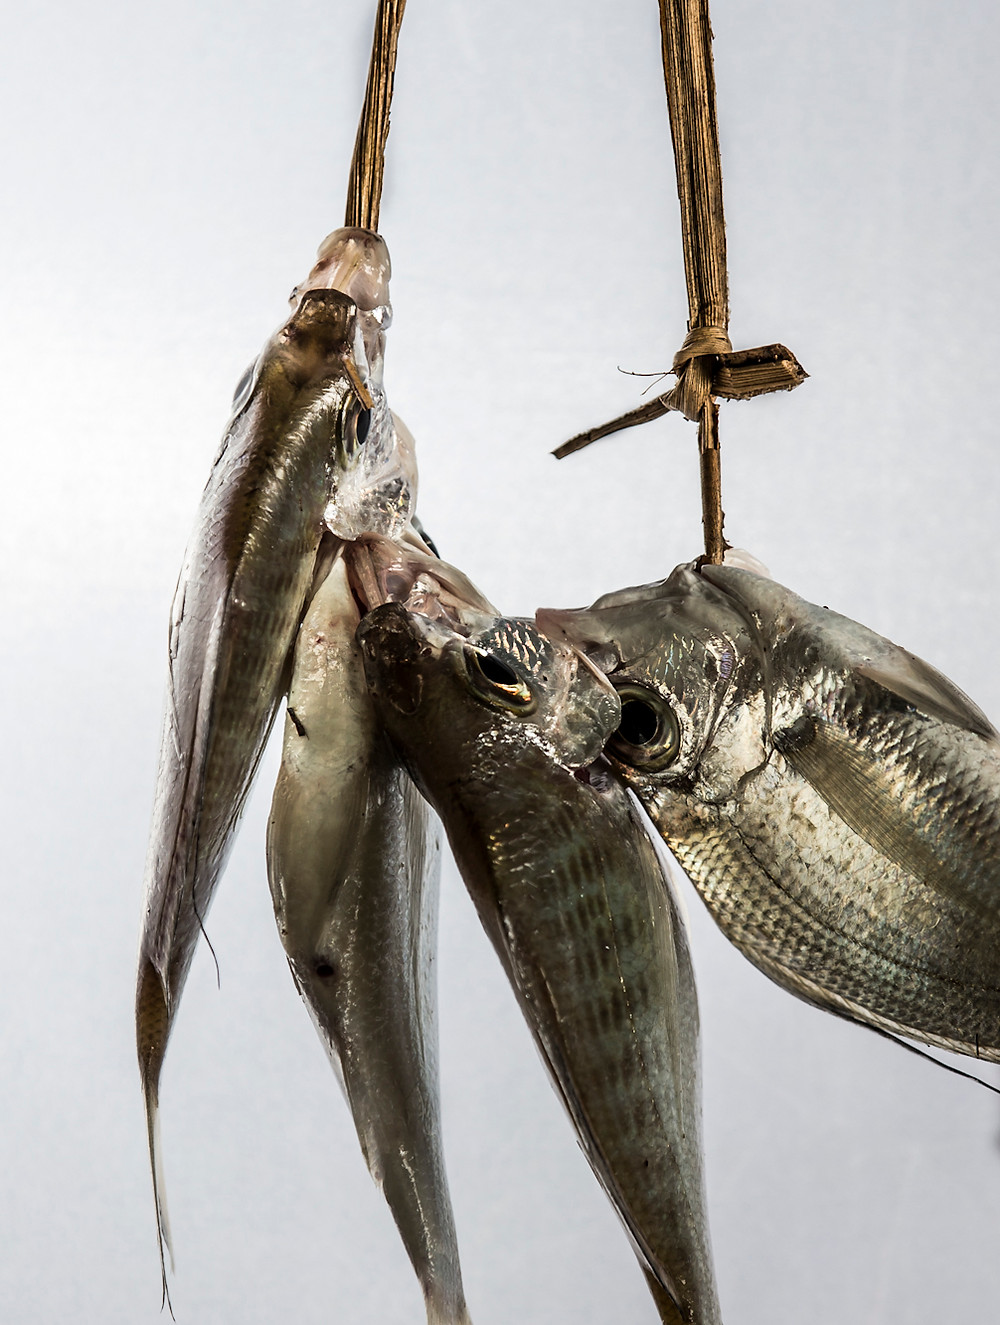 Fish food creative